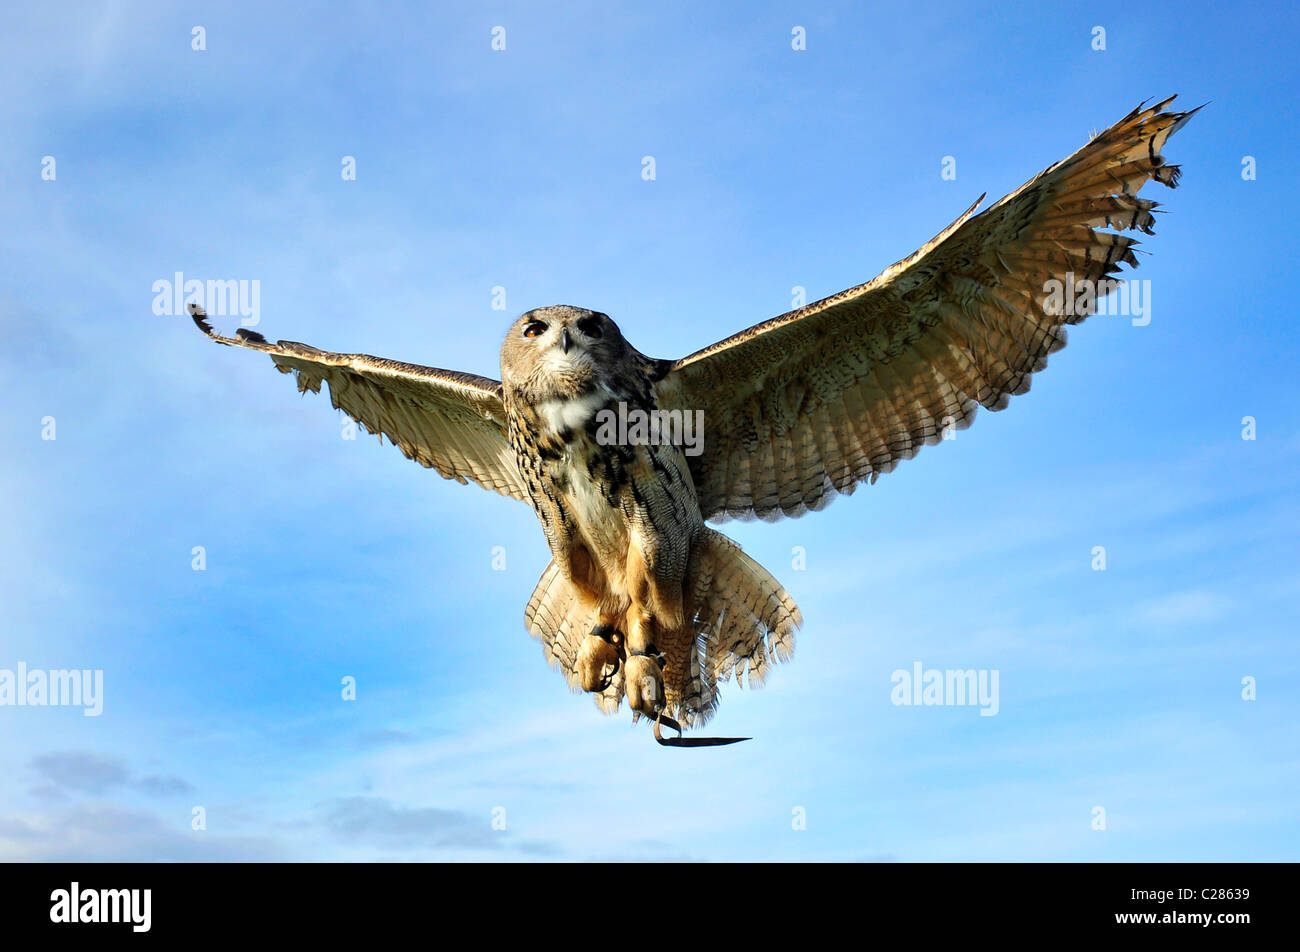 Captive European Eagle Owl in mid flight - Stock Image